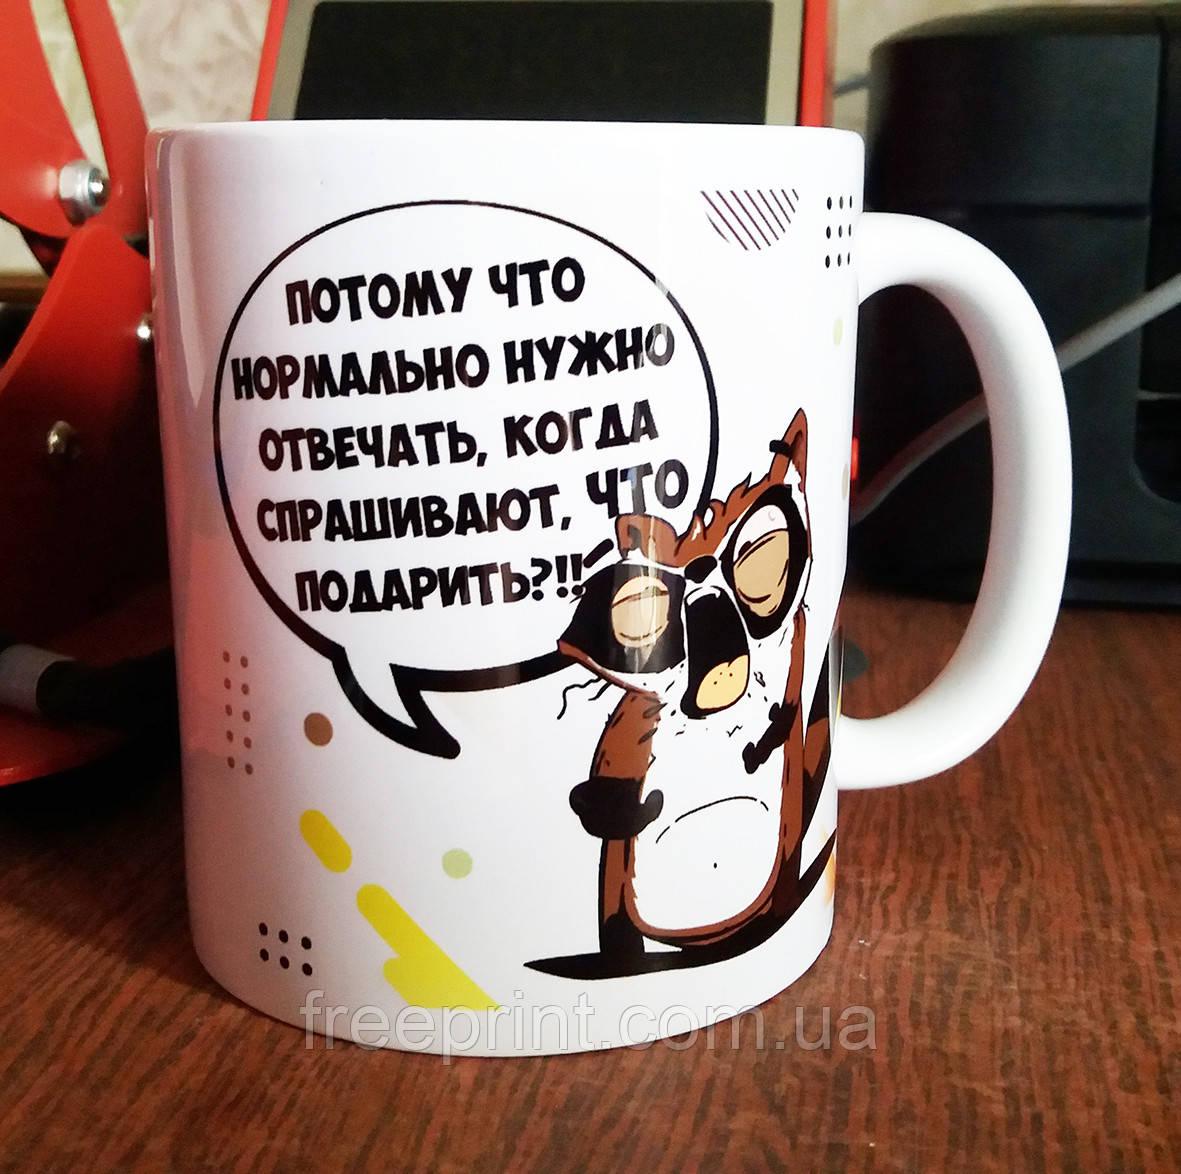 "Чашка-прикол ""Дари что хочешь"". Подарочная чашка-сувенир 18+"